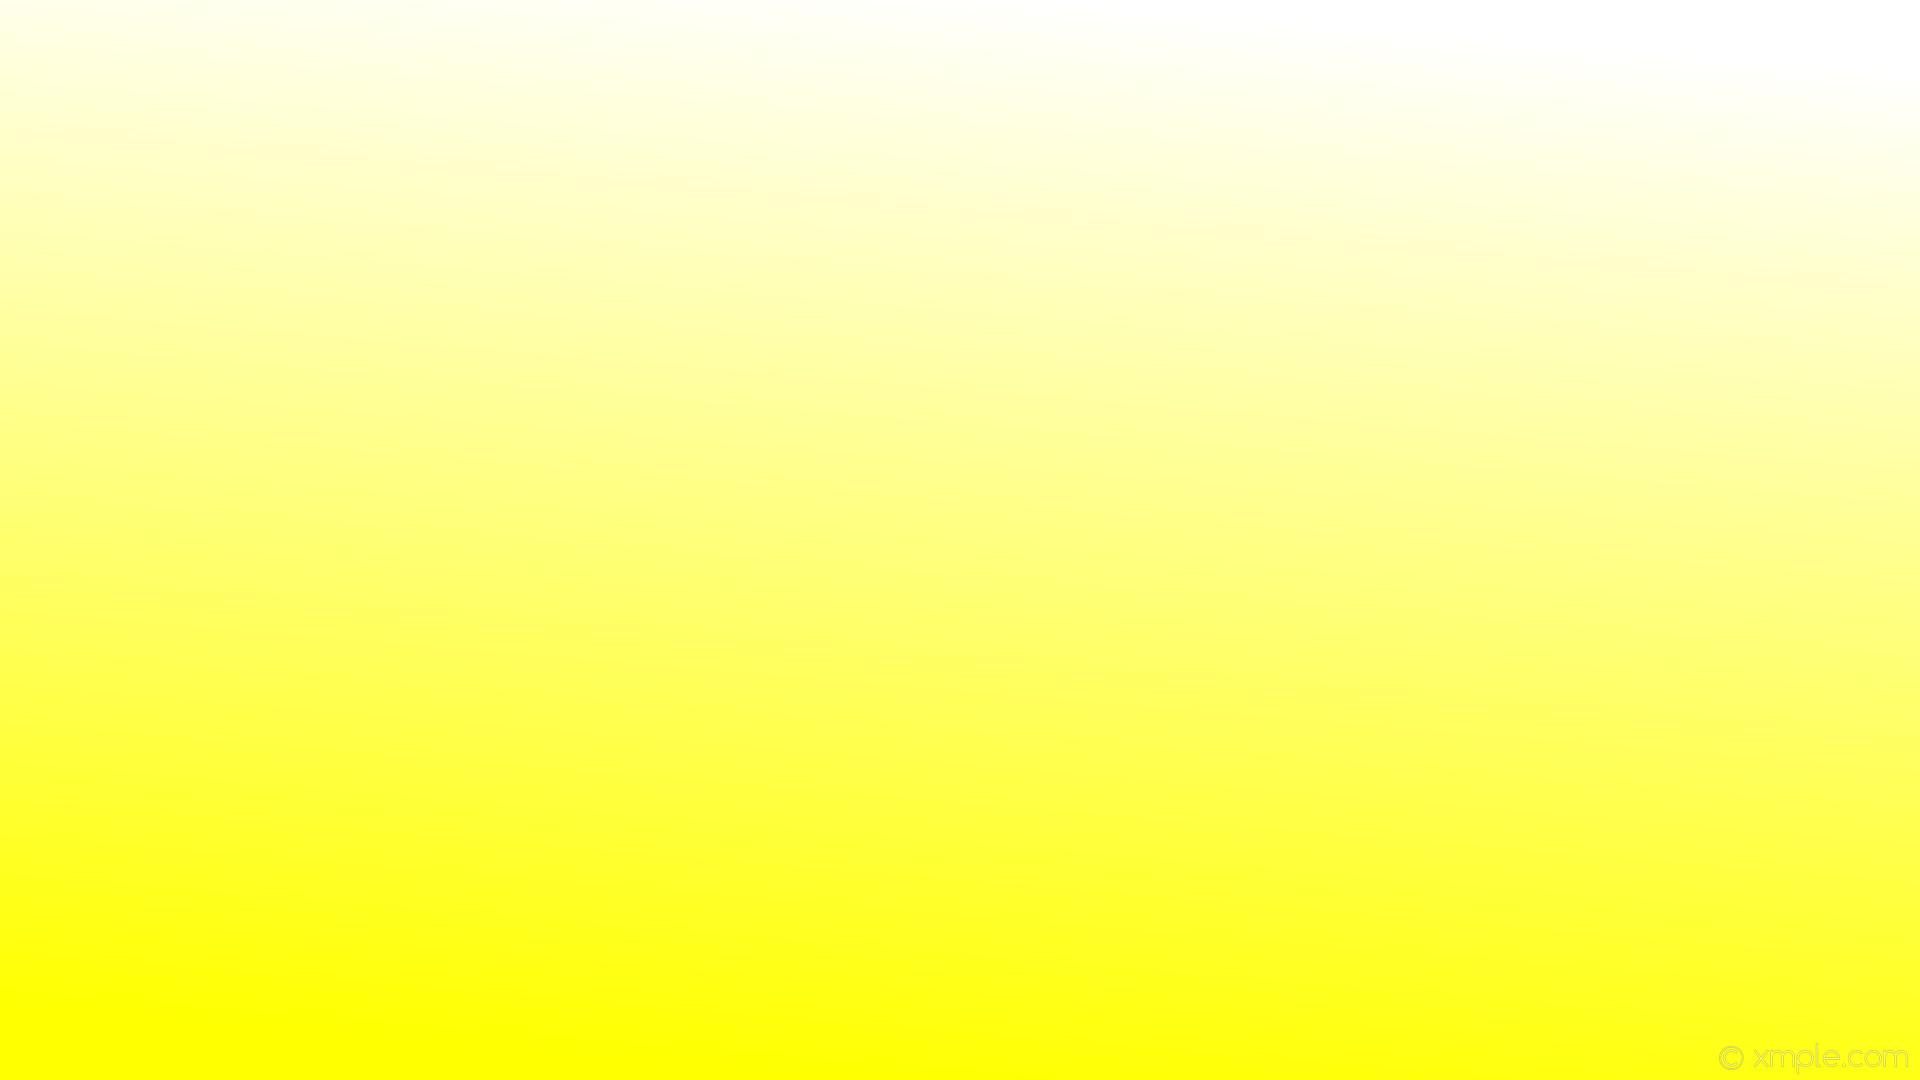 wallpaper white yellow gradient linear #ffffff #ffff00 75°